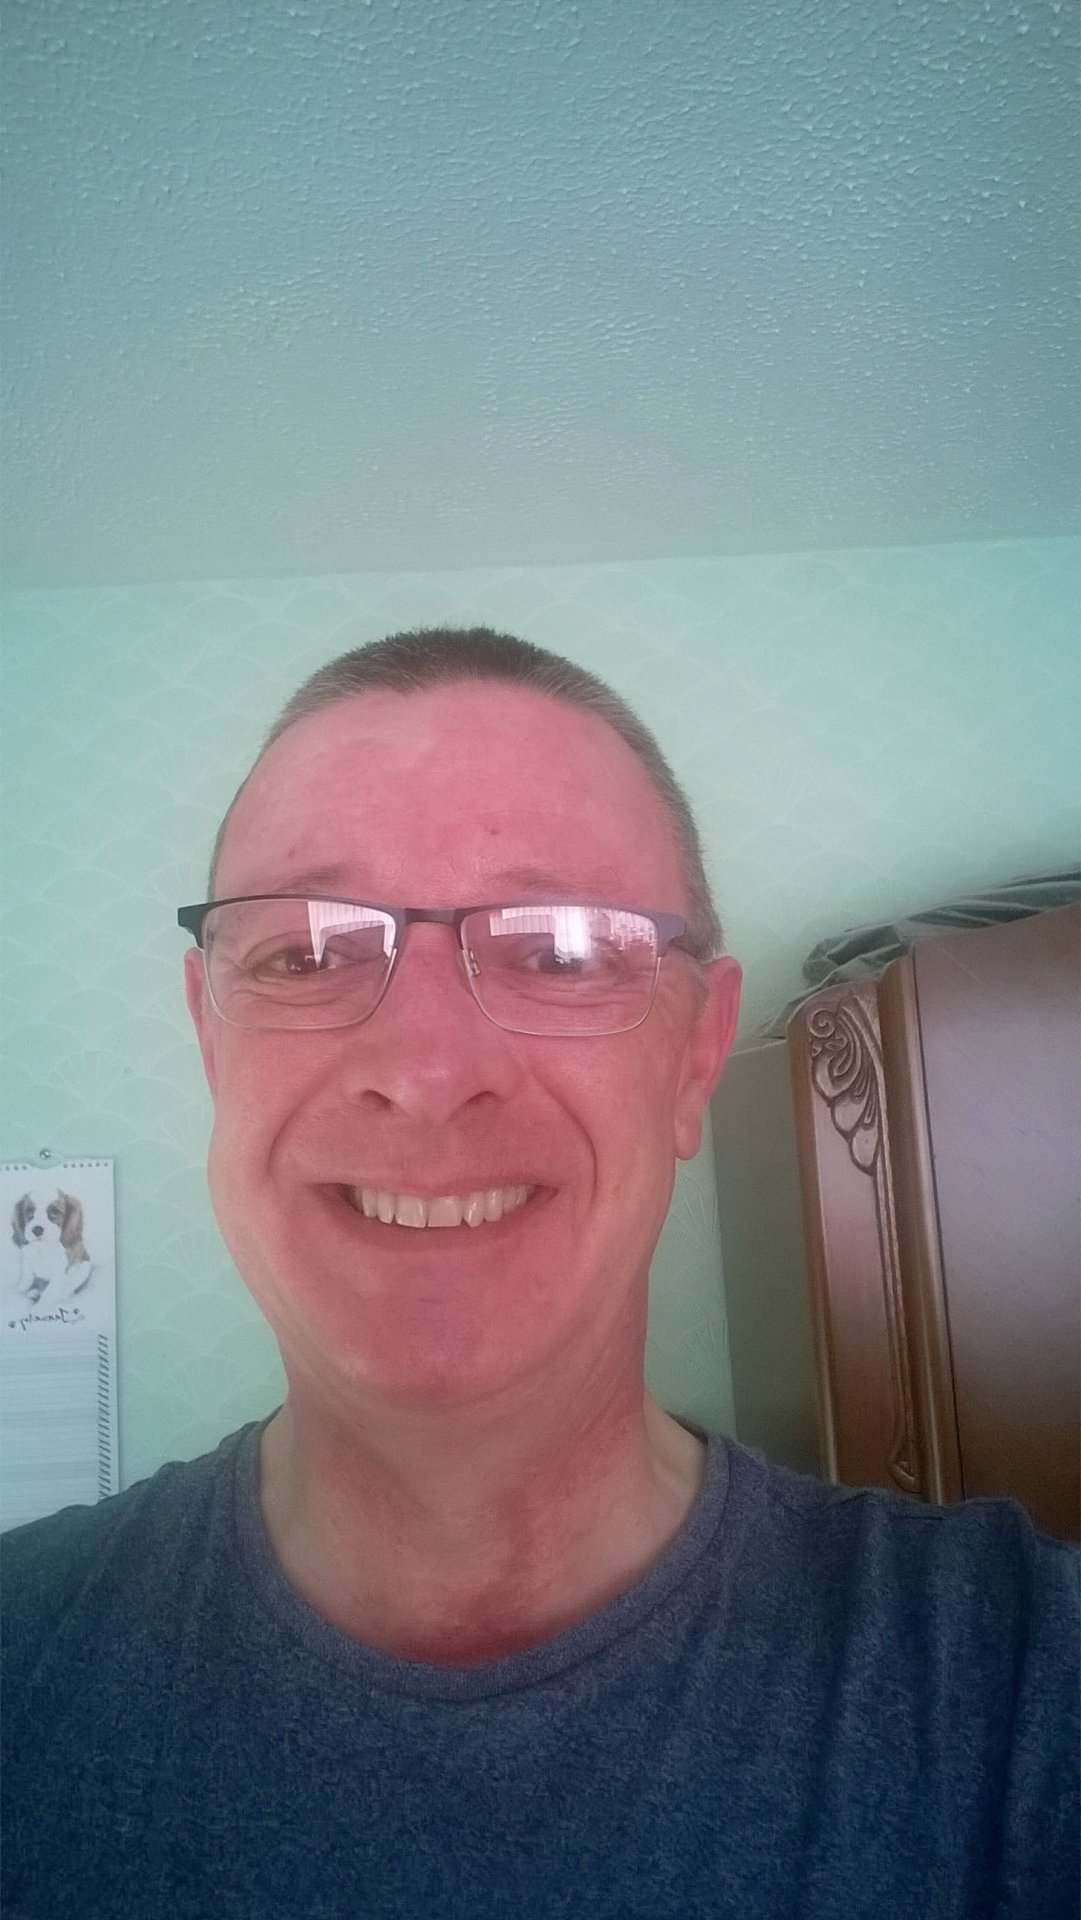 hornymike from Gateshead,United Kingdom